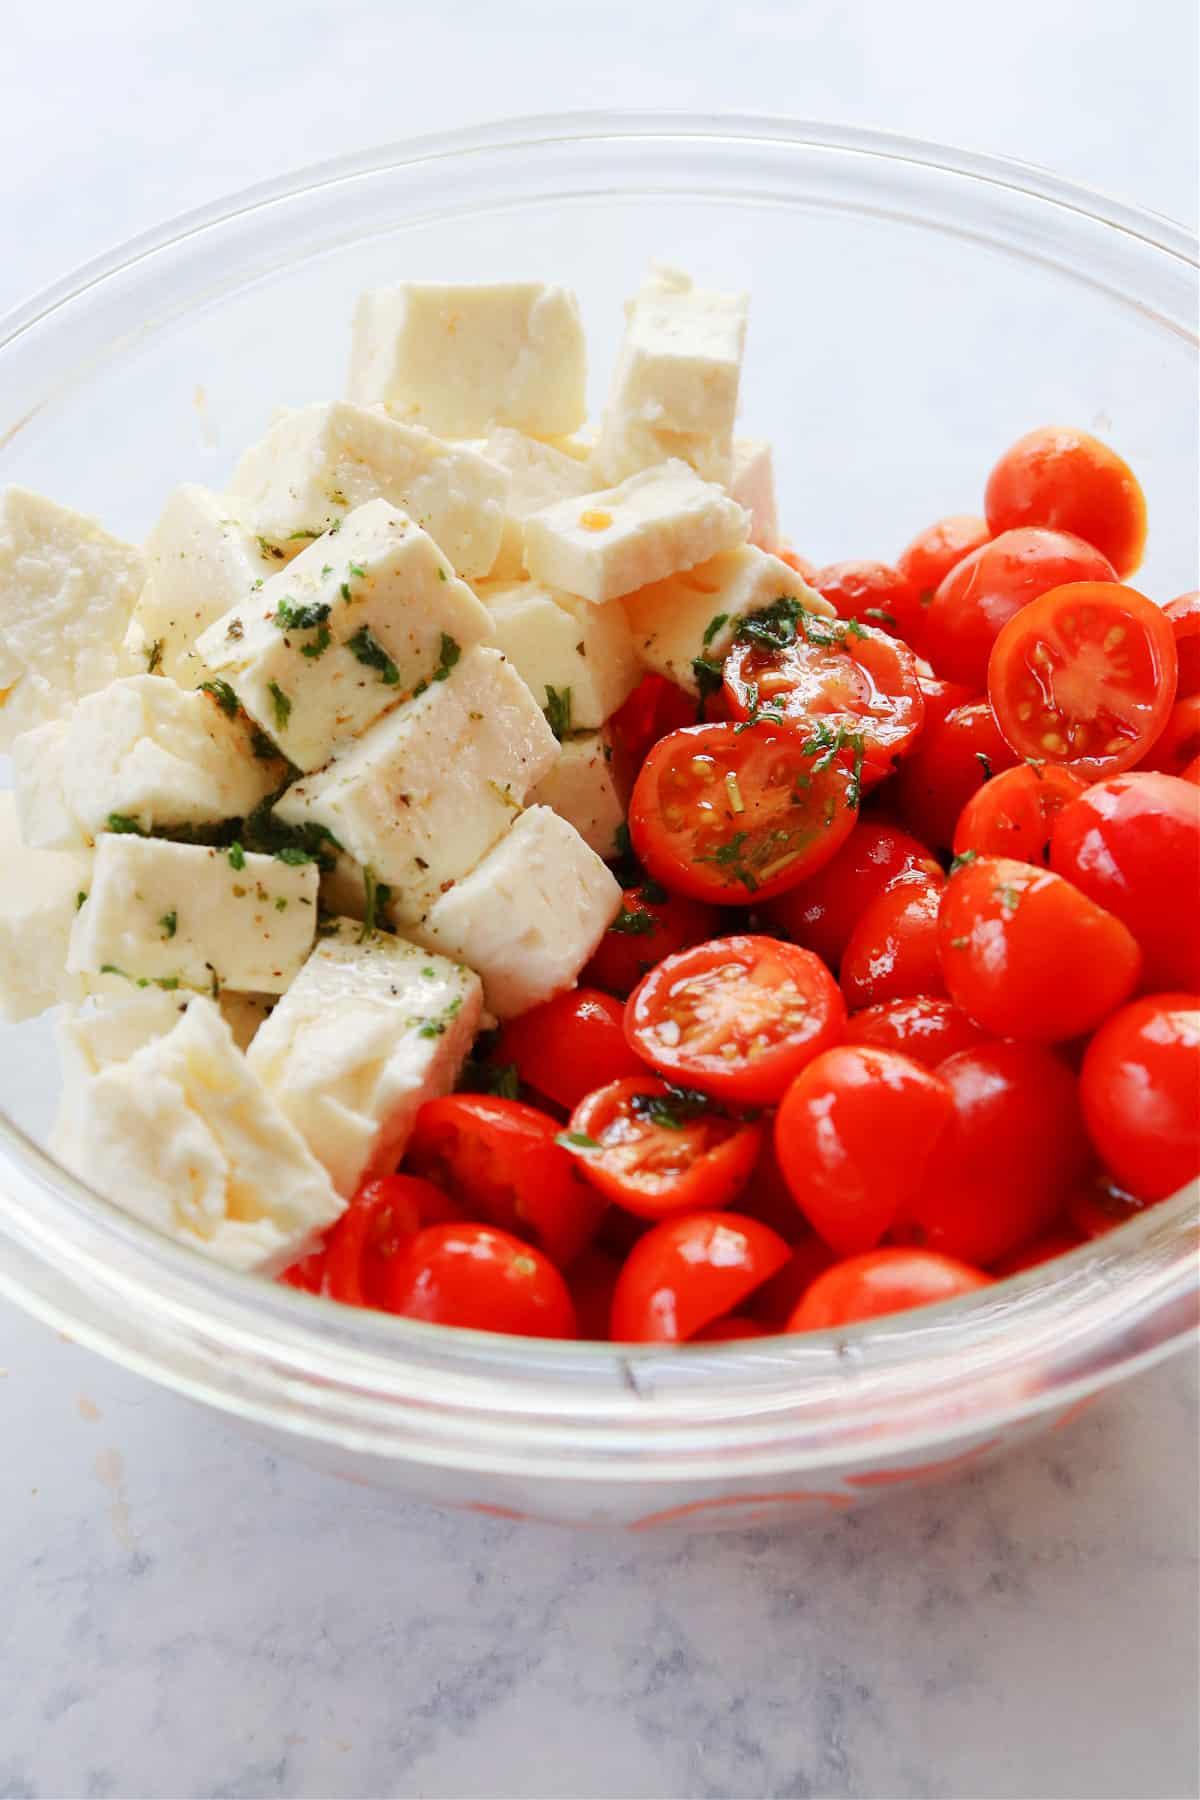 how to make tomato feta salad Tomato Feta Salad